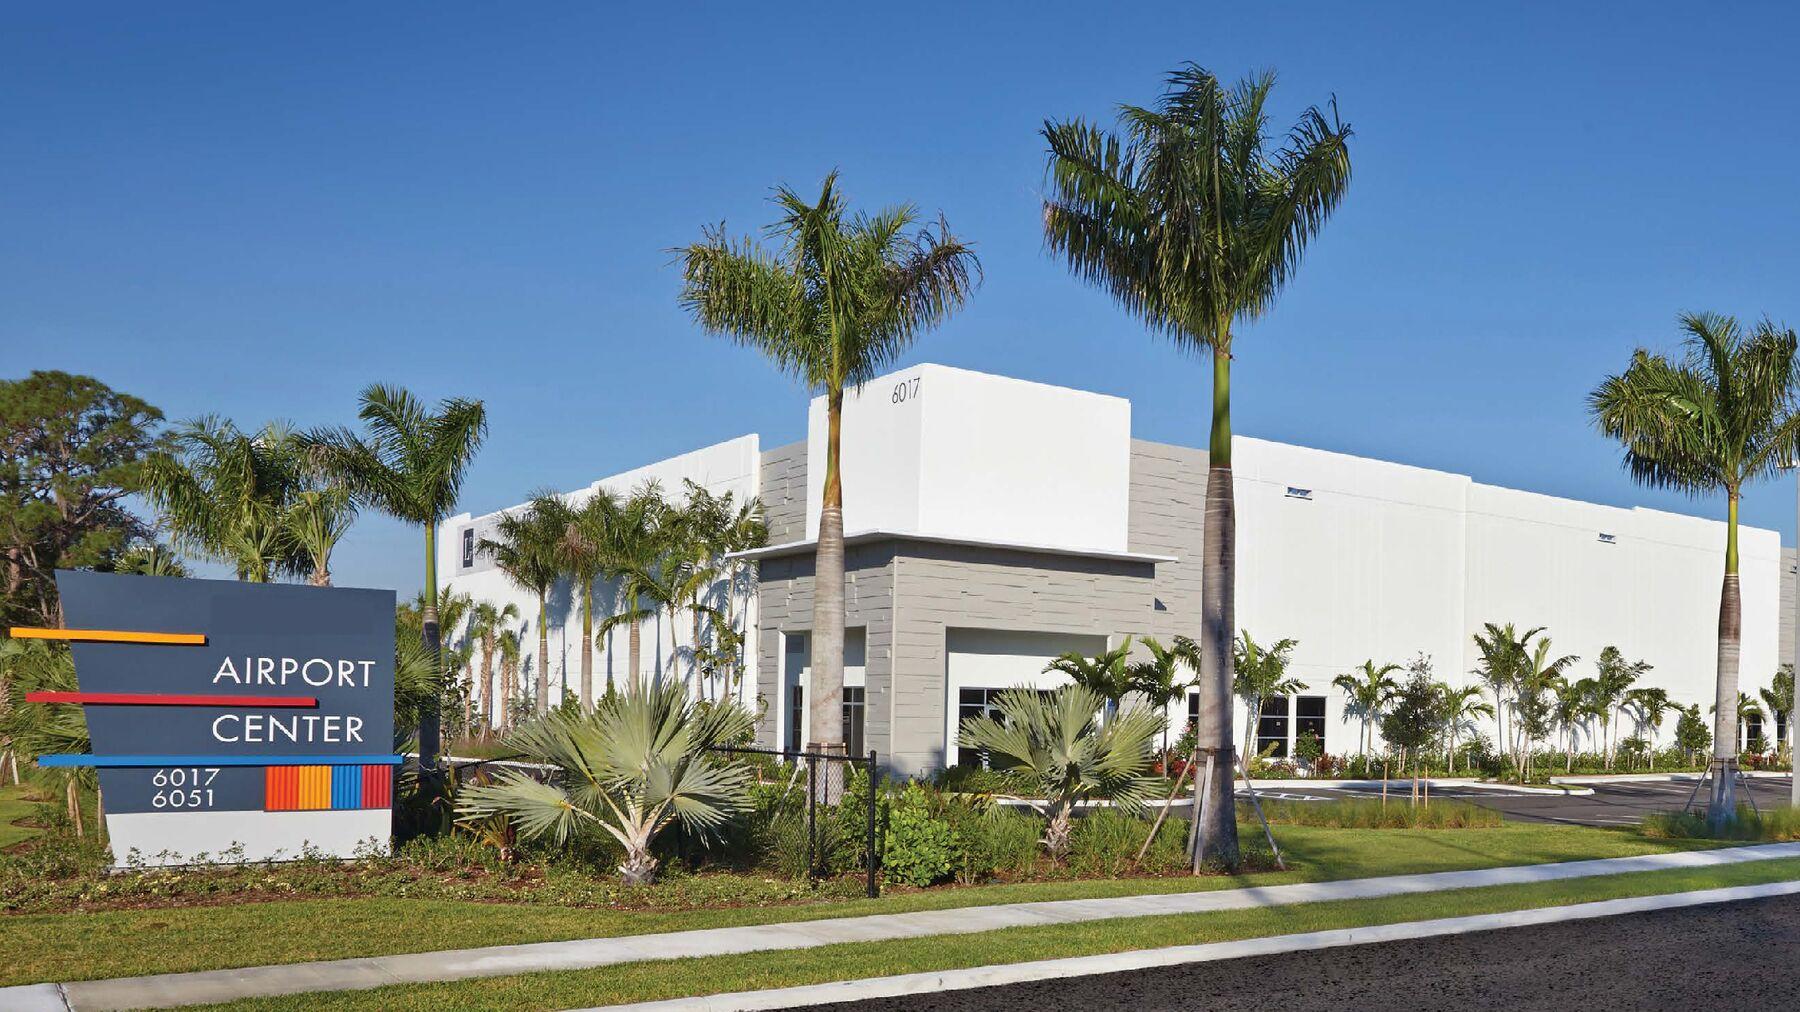 DPM-PBC00904-Airport-Center-4-Property-Photo.jpg